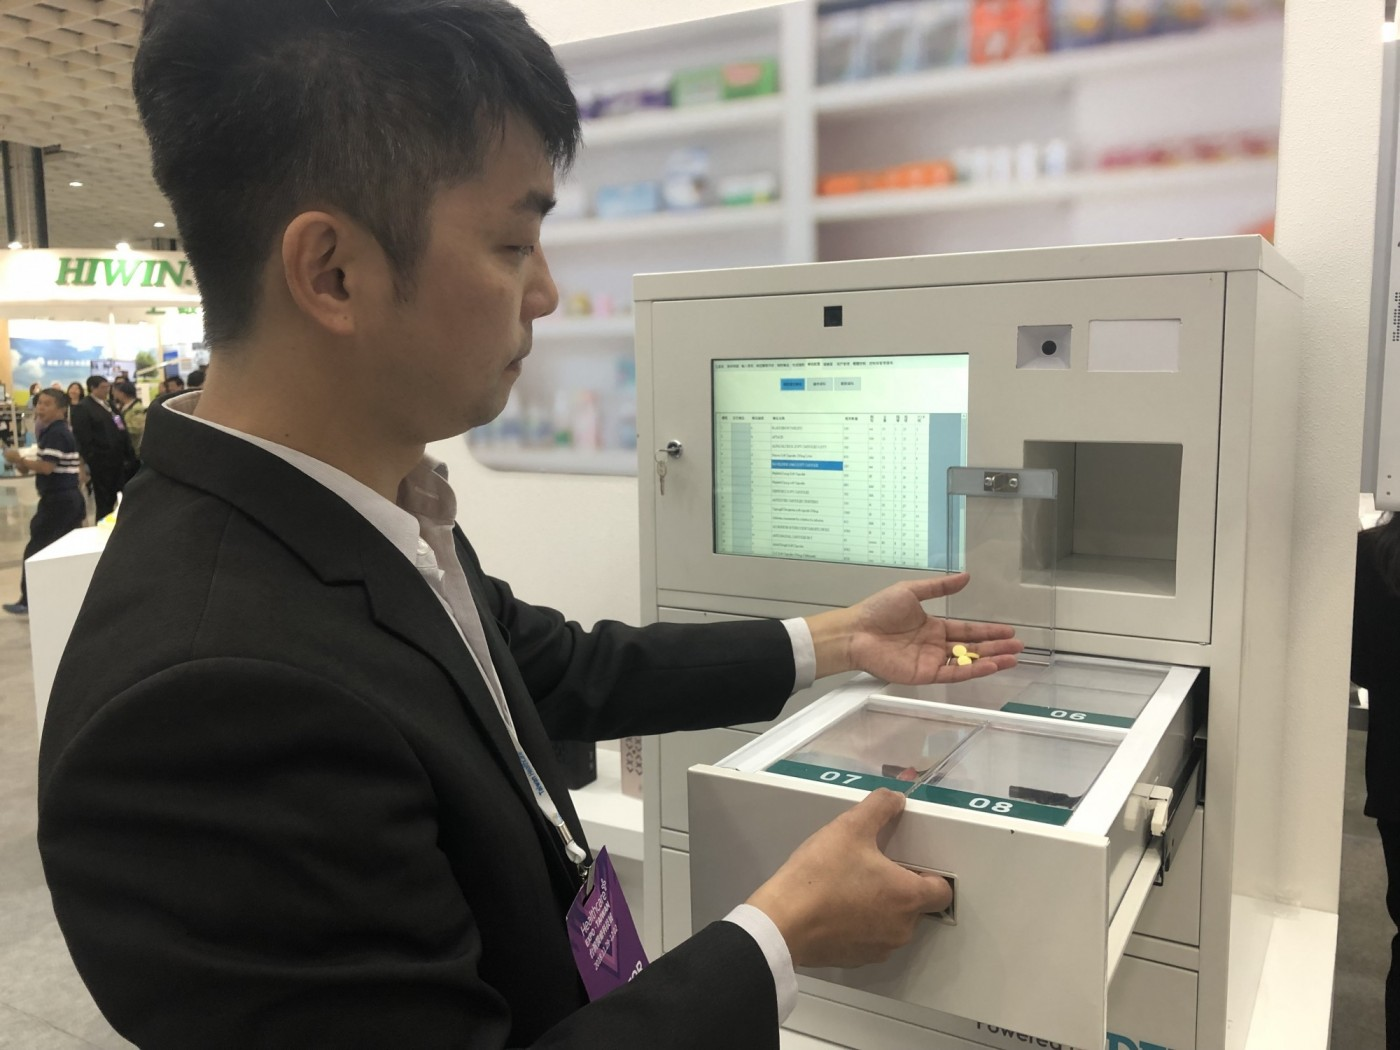 BenQ跨界醫療產品,智慧藥櫃、3D列印植牙方案通通來